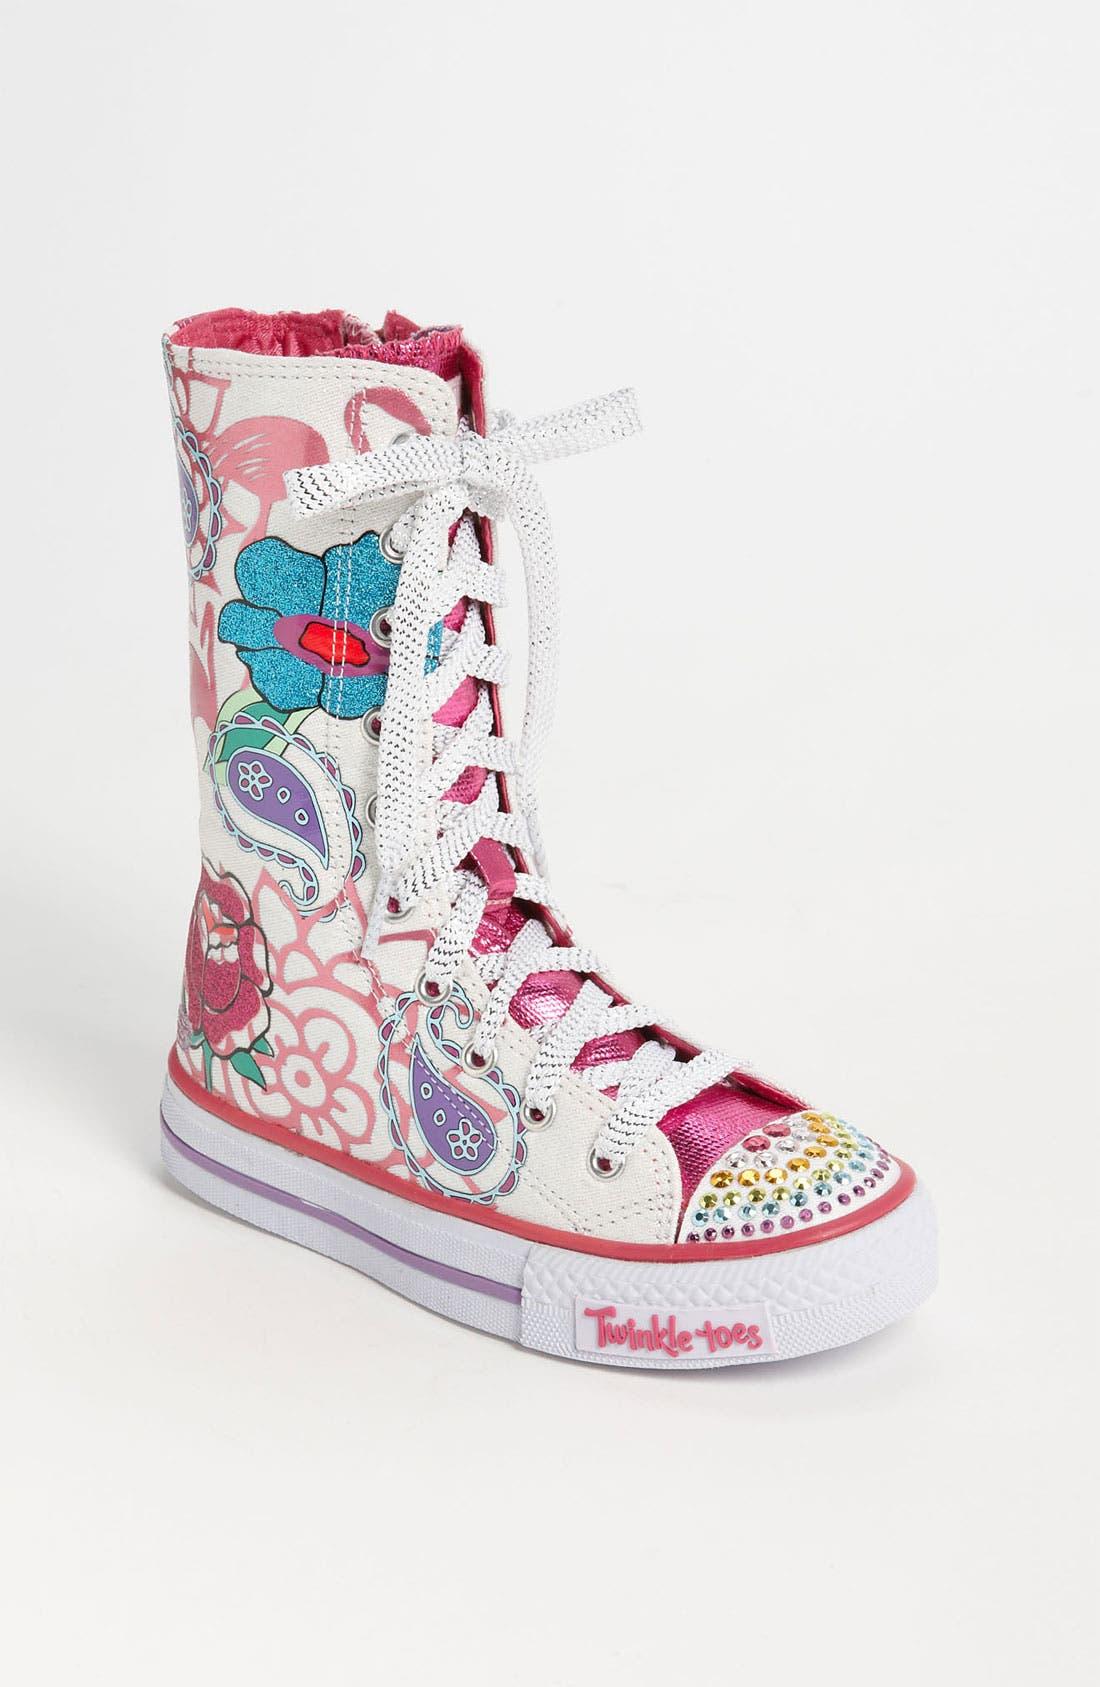 Main Image - SKECHERS 'Twinkle Toes - Shuffles Mellow Me' Sneaker (Toddler & Little Kid)